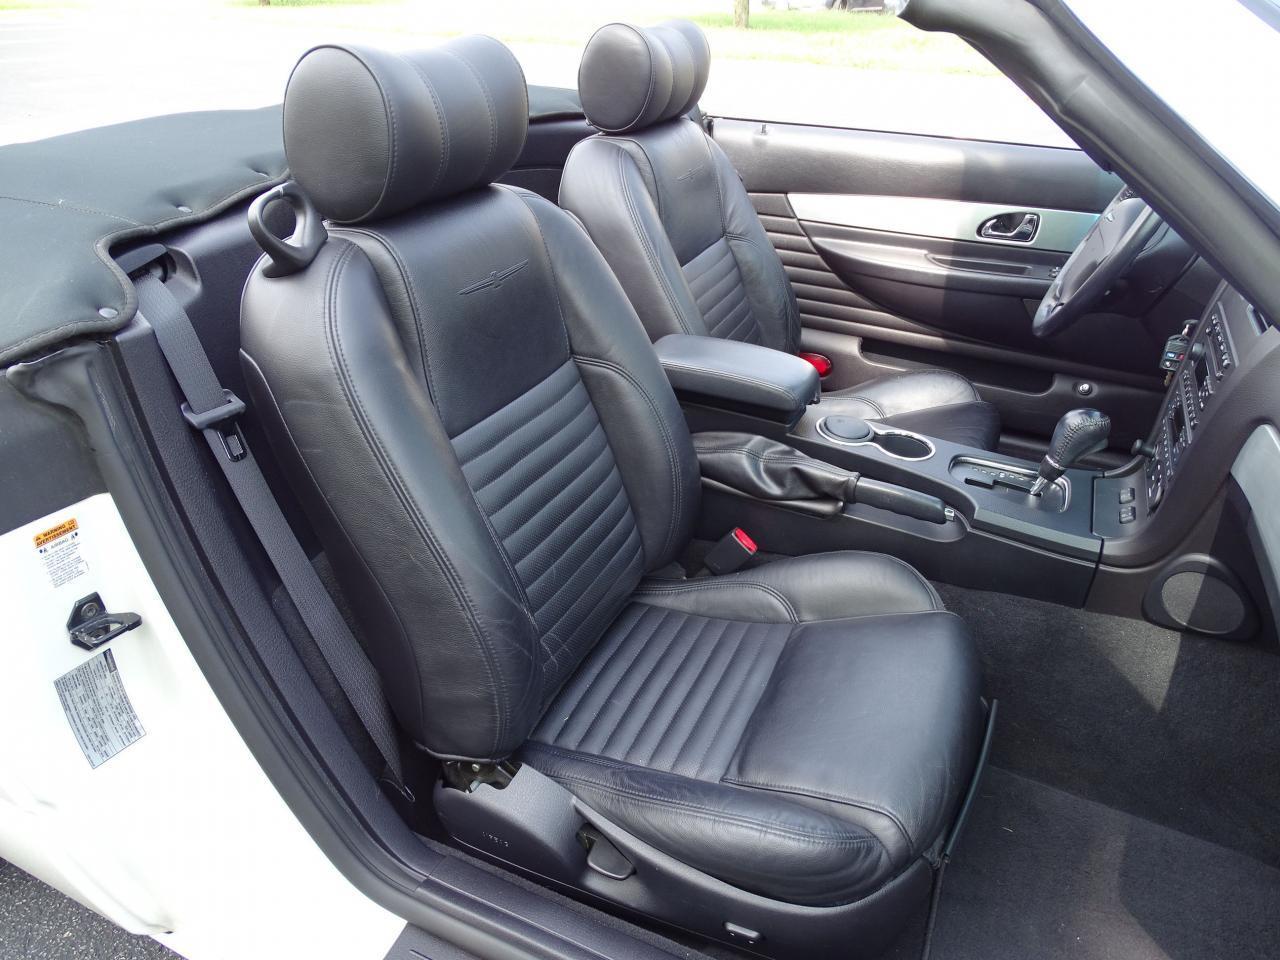 2003 Ford Thunderbird (CC-1227518) for sale in O'Fallon, Illinois